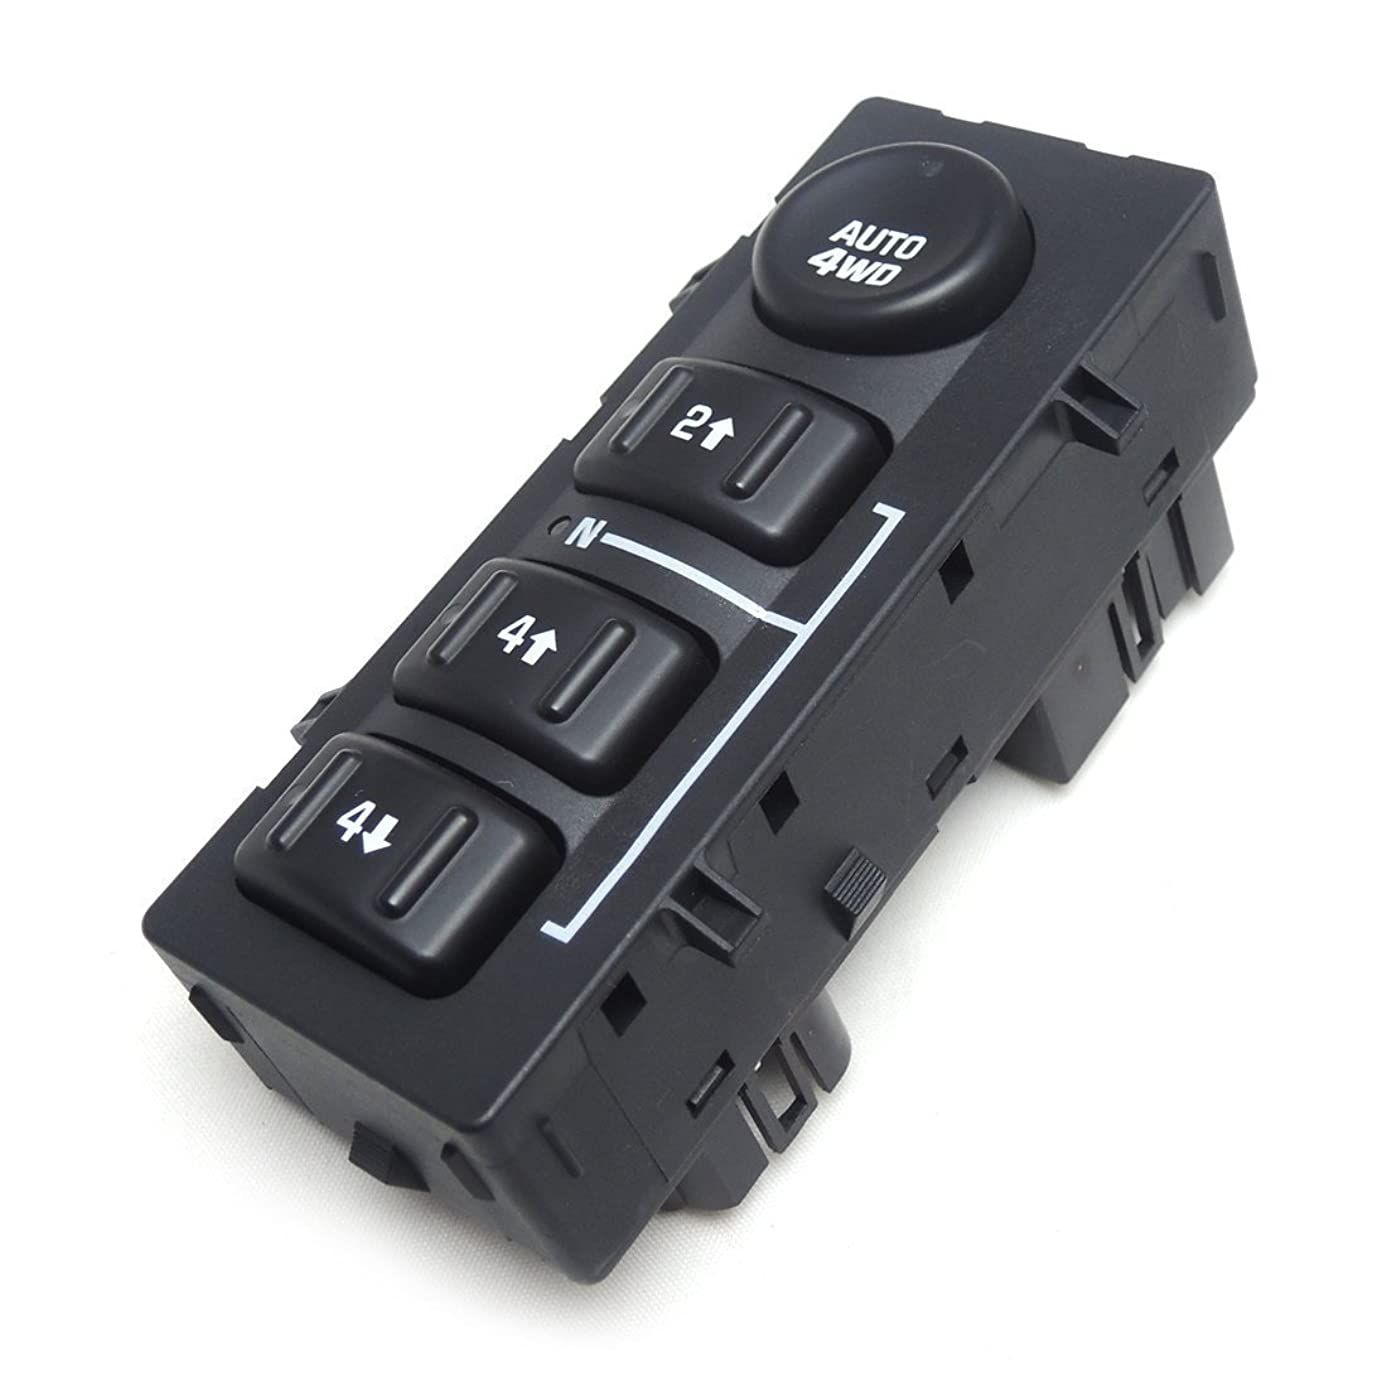 4WD 4x4 Wheel Drive Switch Transfer Case Selector Dash Switch for 03-06 Silverado Pickup Truck SUV